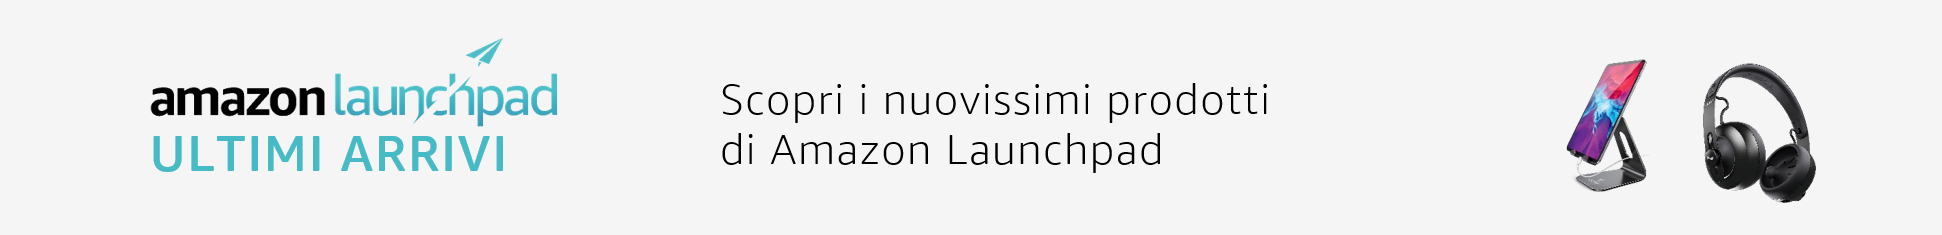 Amazon Launchpad - ultimi arrivi